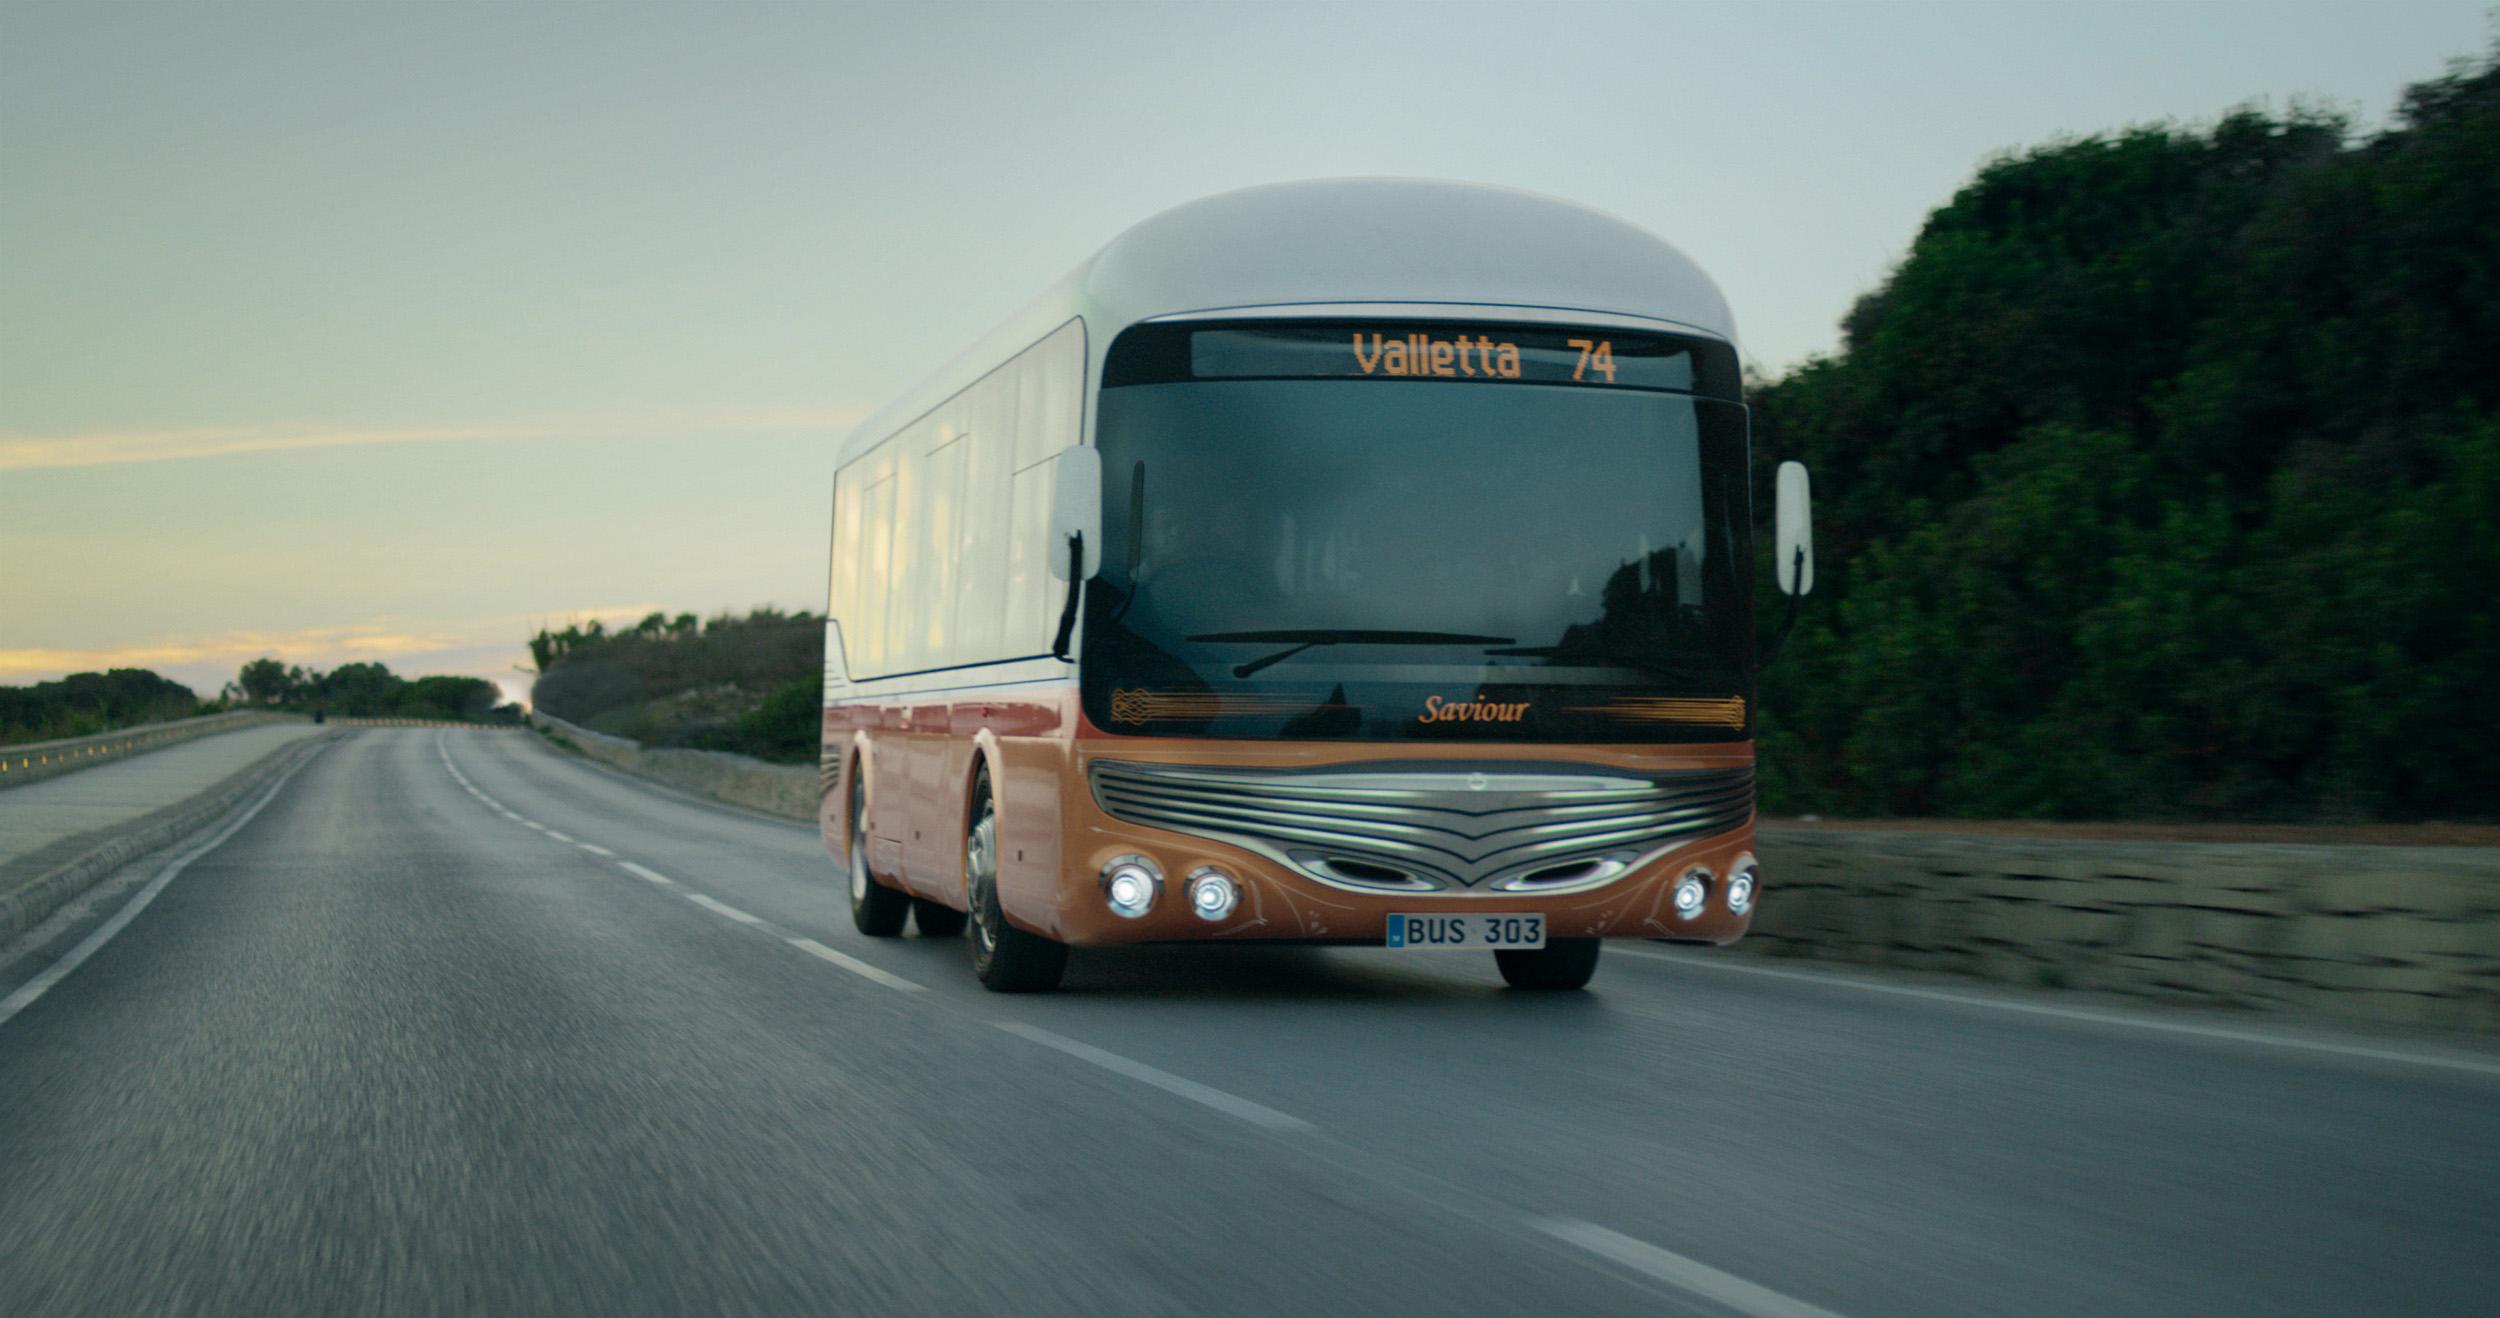 Visualisation_06_Mizzi Studio_Malta Bus Reborn_web.jpg